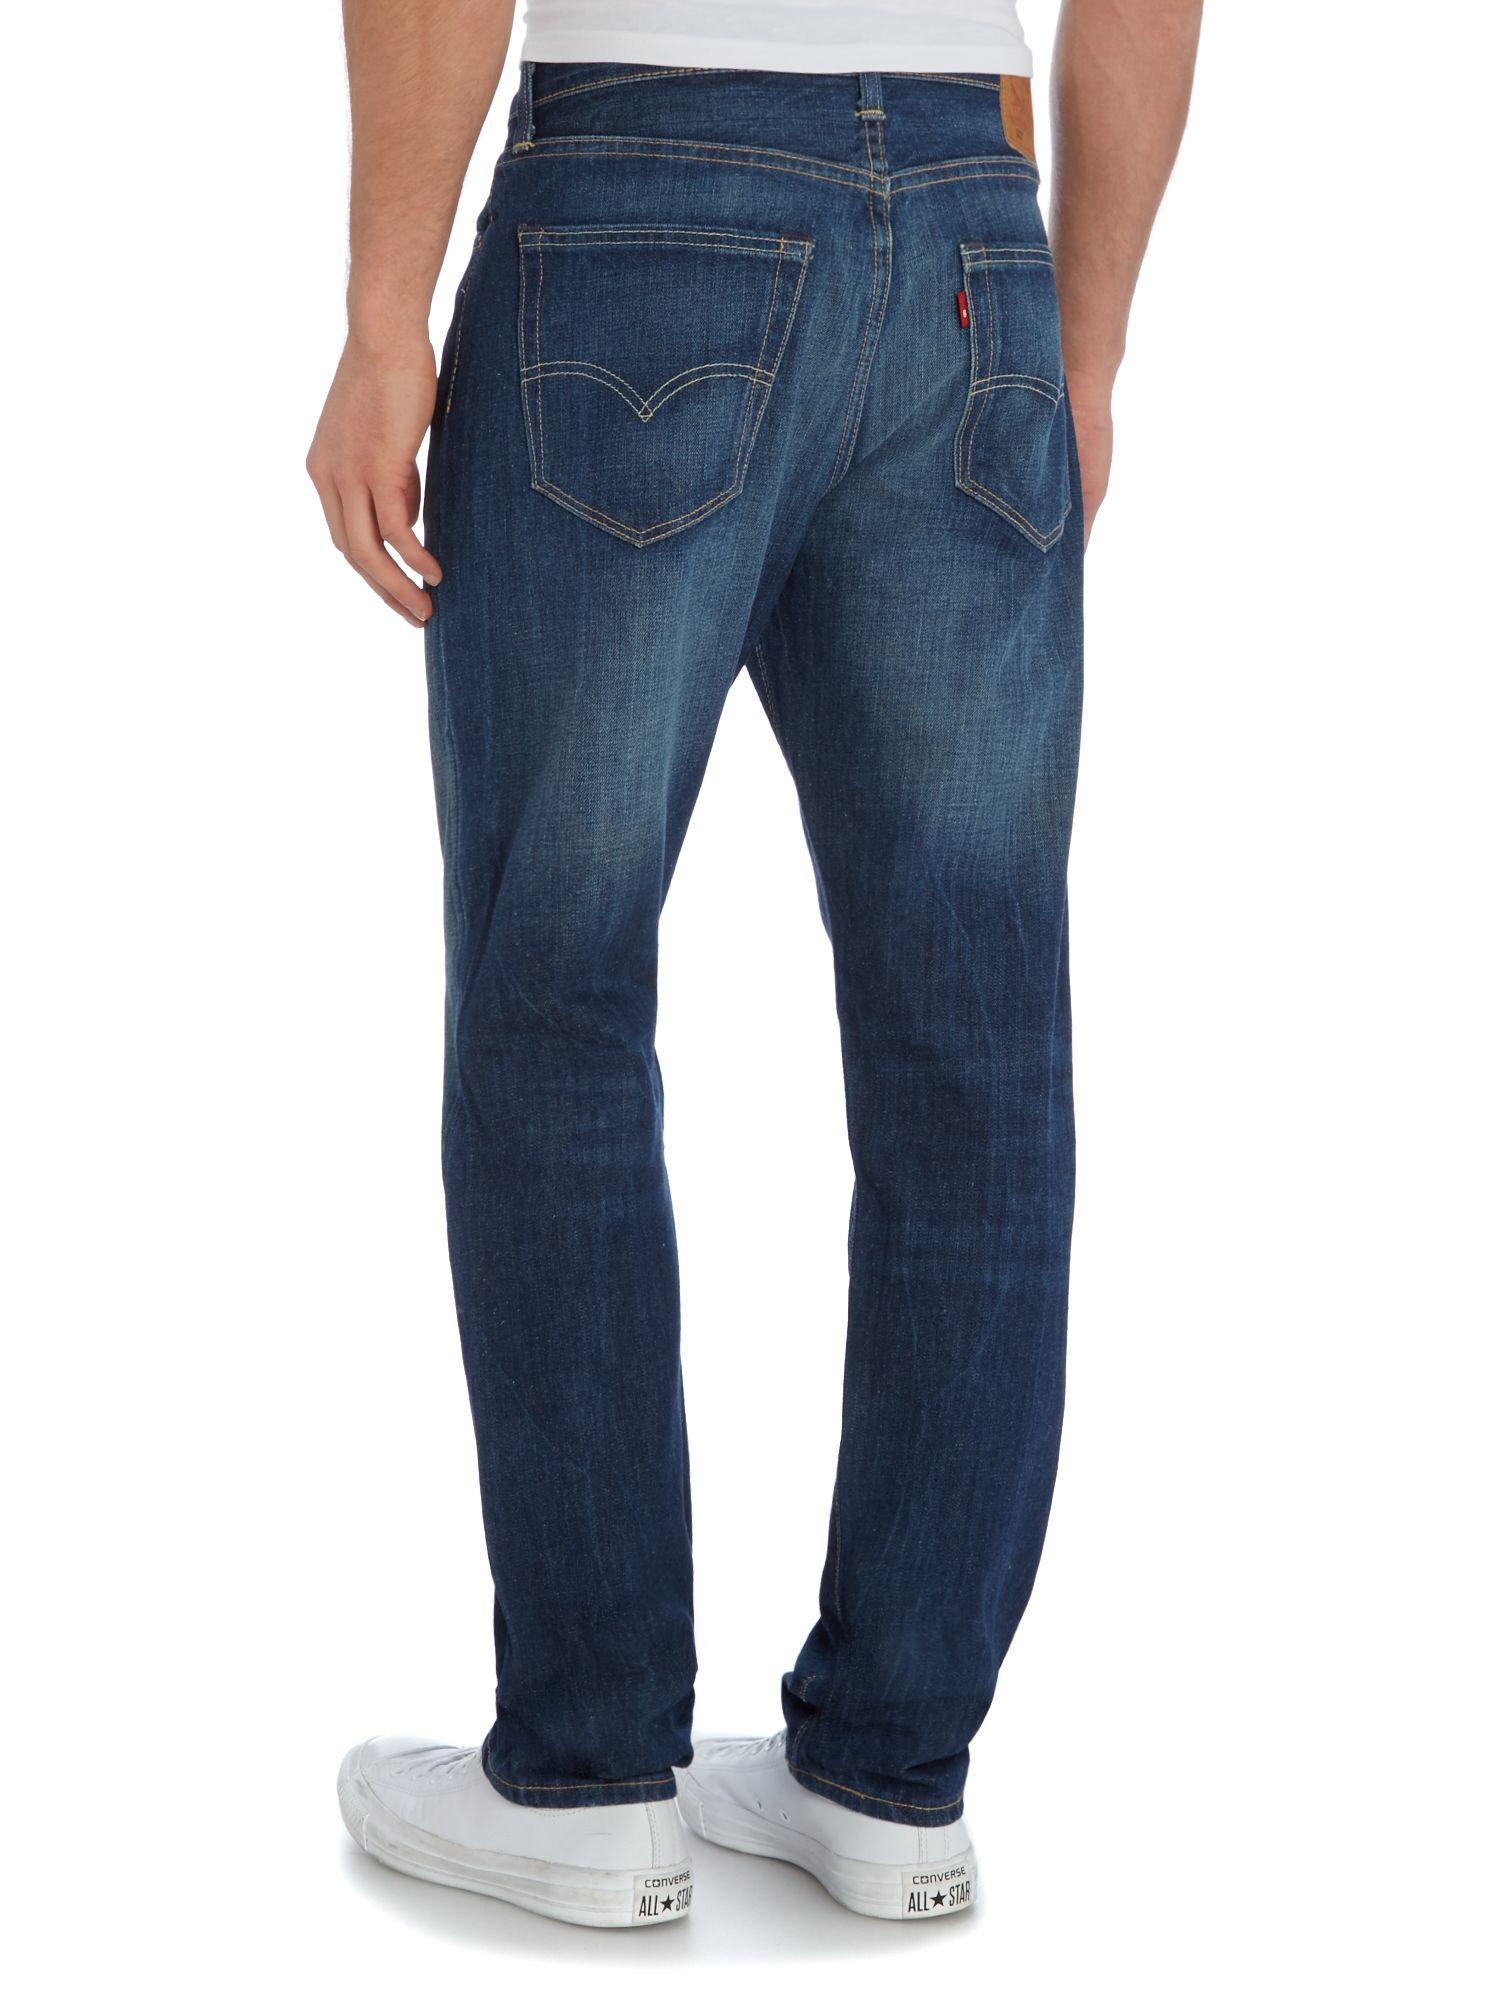 Levi's 522 Scandia Slim Taper Jeans in Denim (Blue) for Men